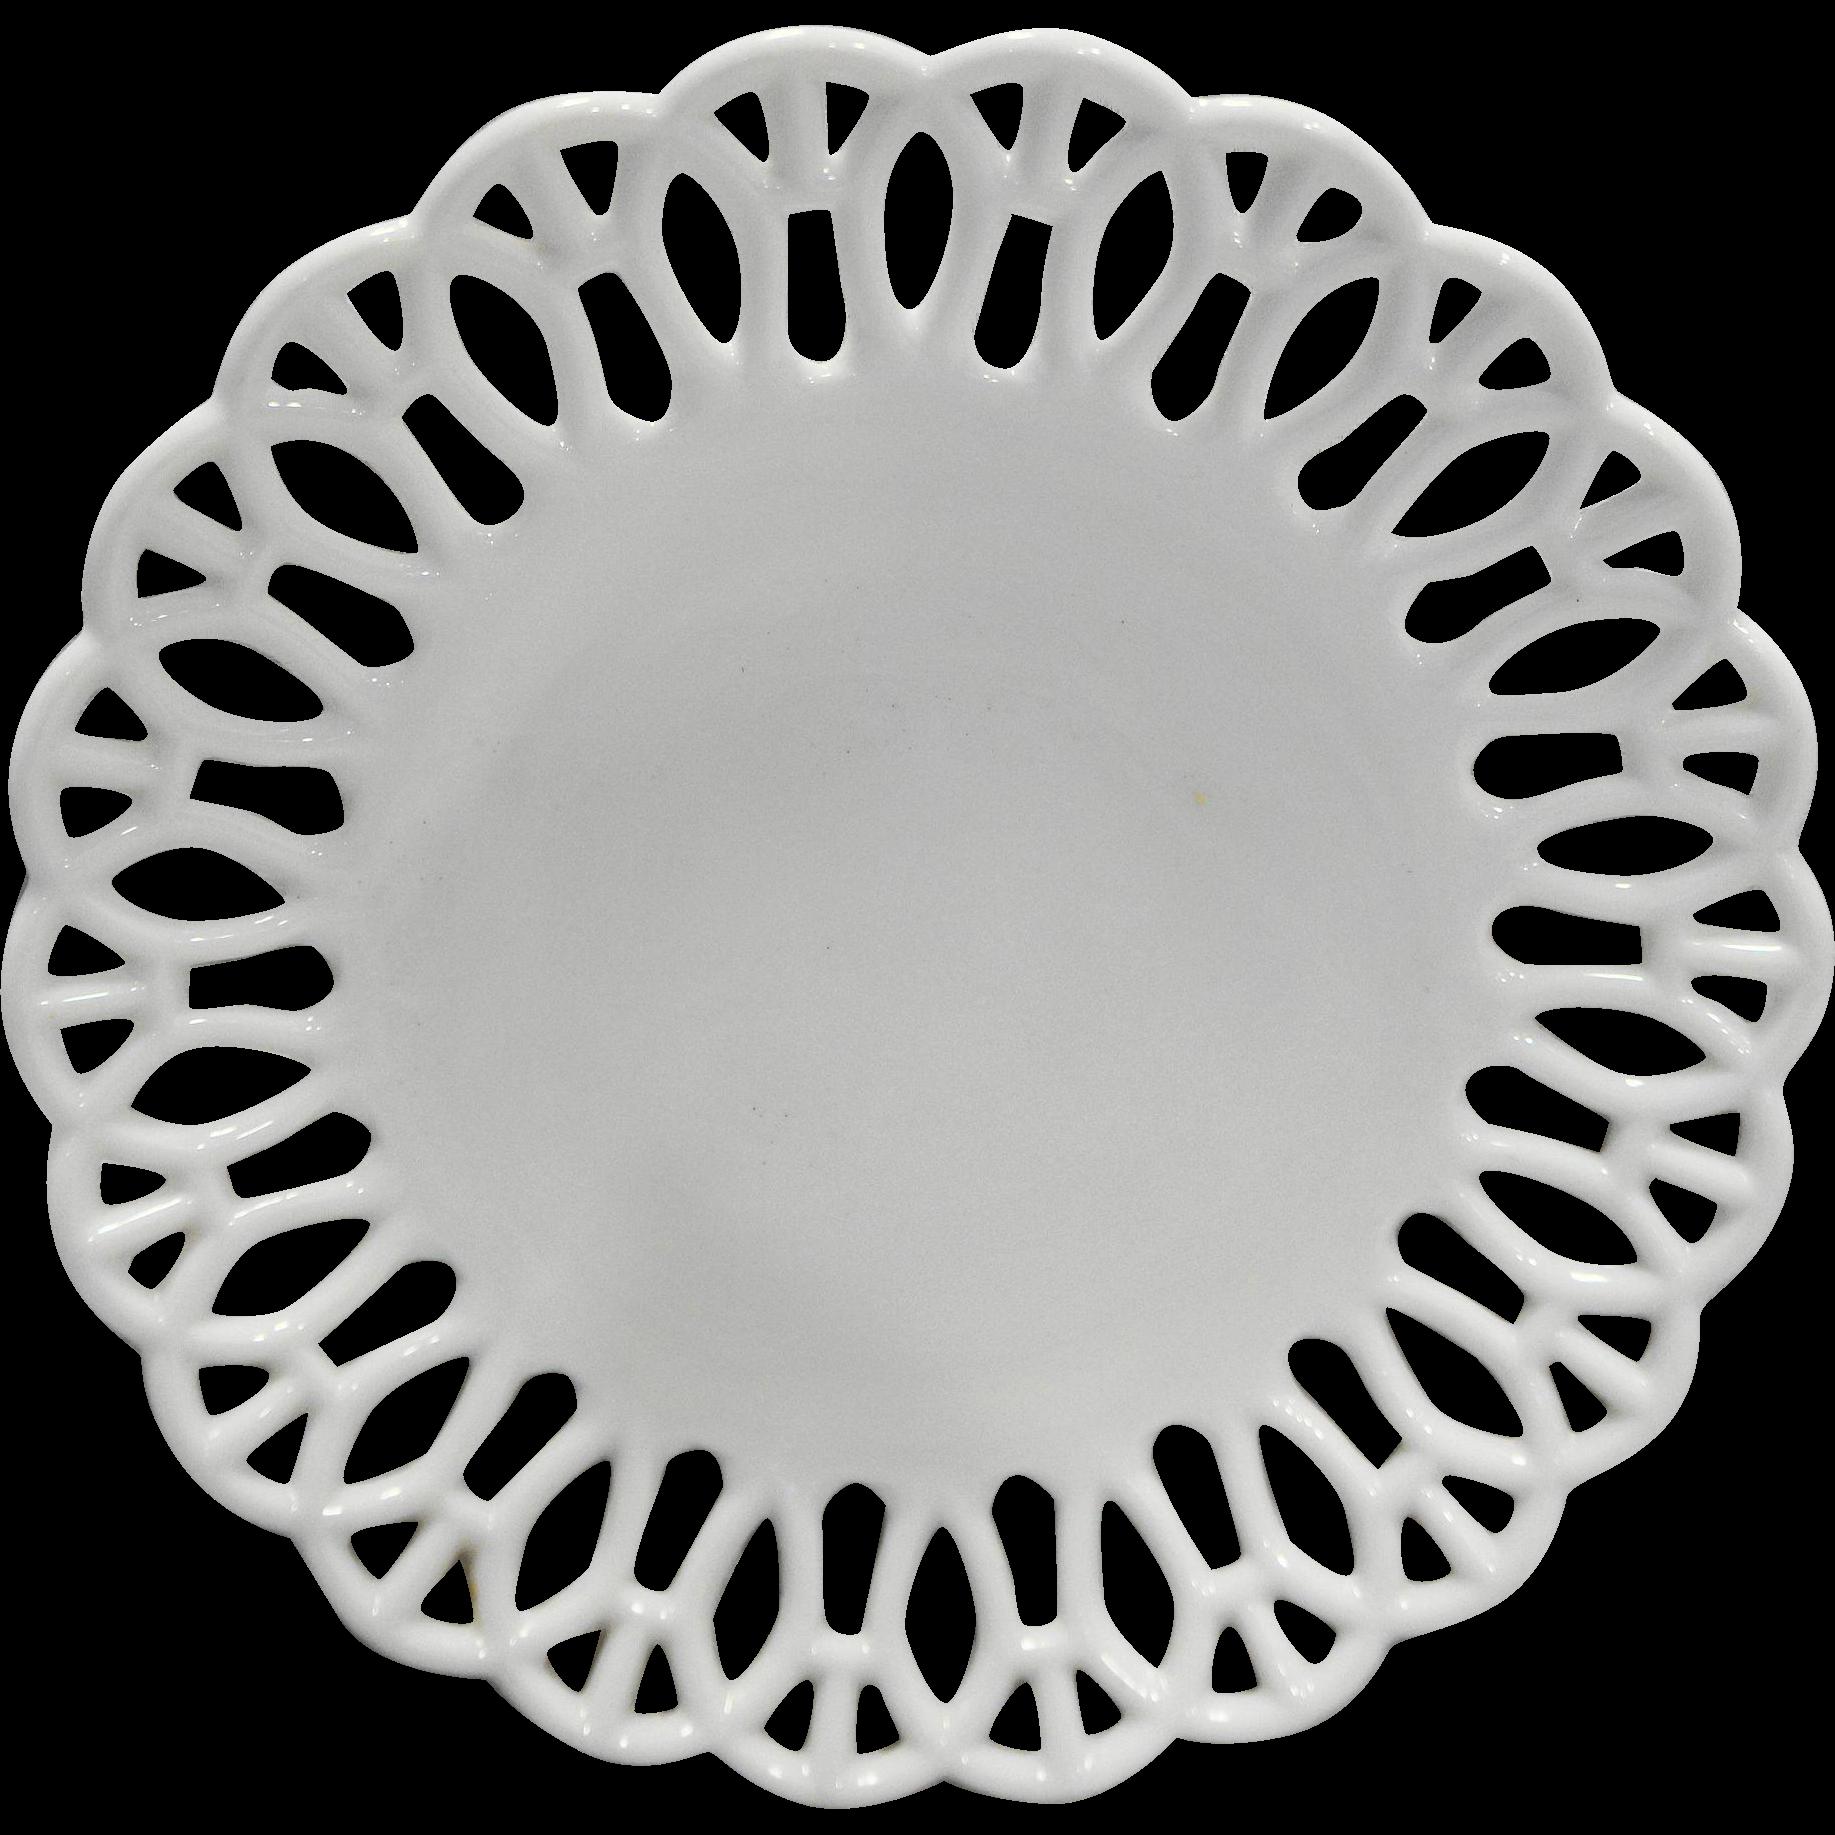 Atterbury H Border White Milk Glass Lace Edge Plate 7 5/8 IN